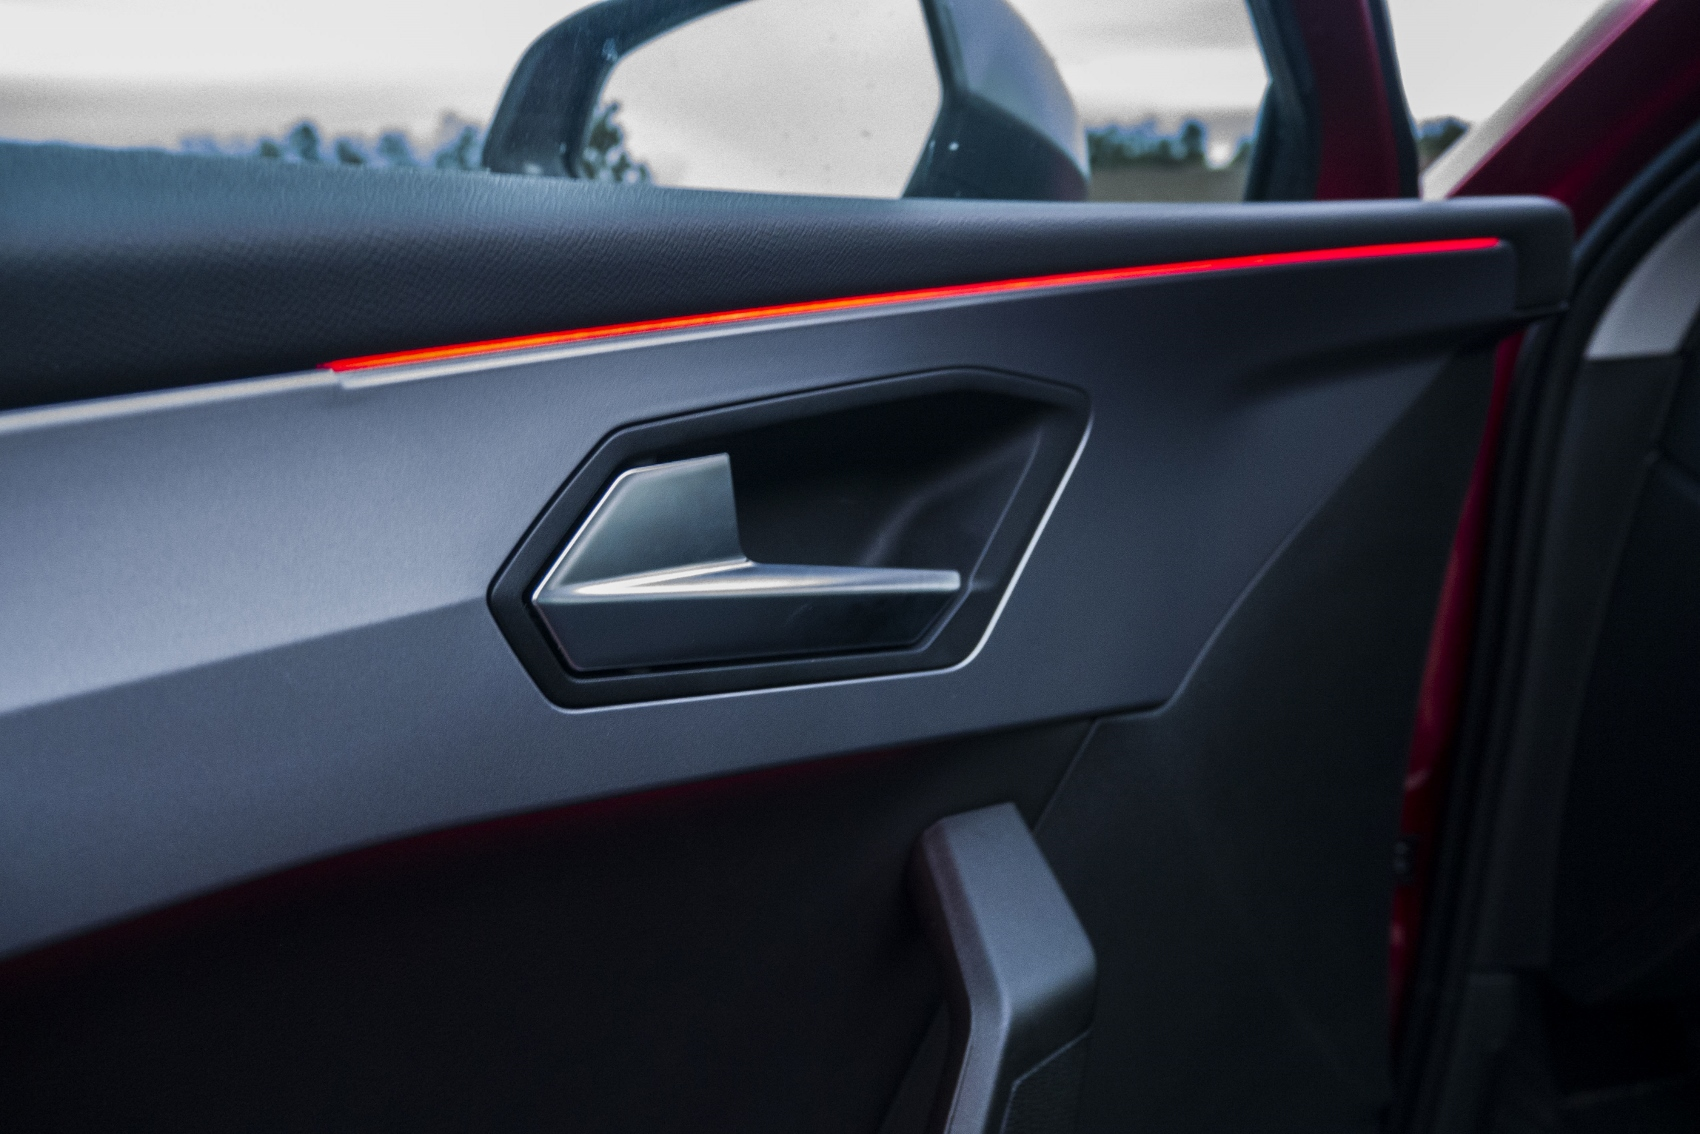 Test: Nový Seat Leon láka na moderné technológie  VrlacbAU2d seat-leon-40